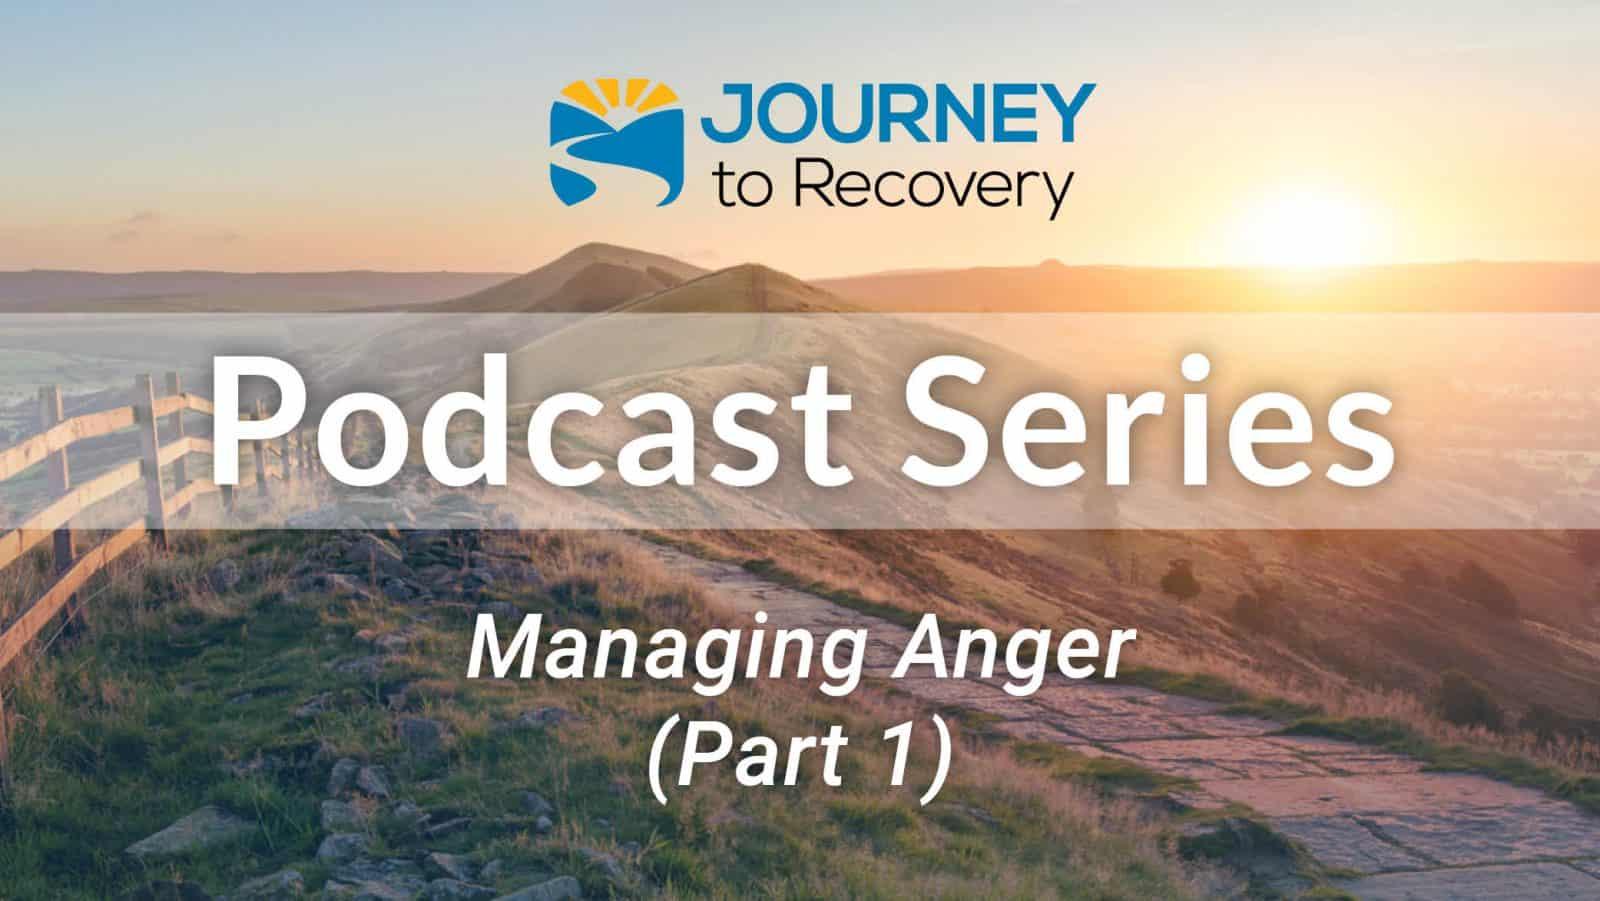 Managing Anger (Part 1)